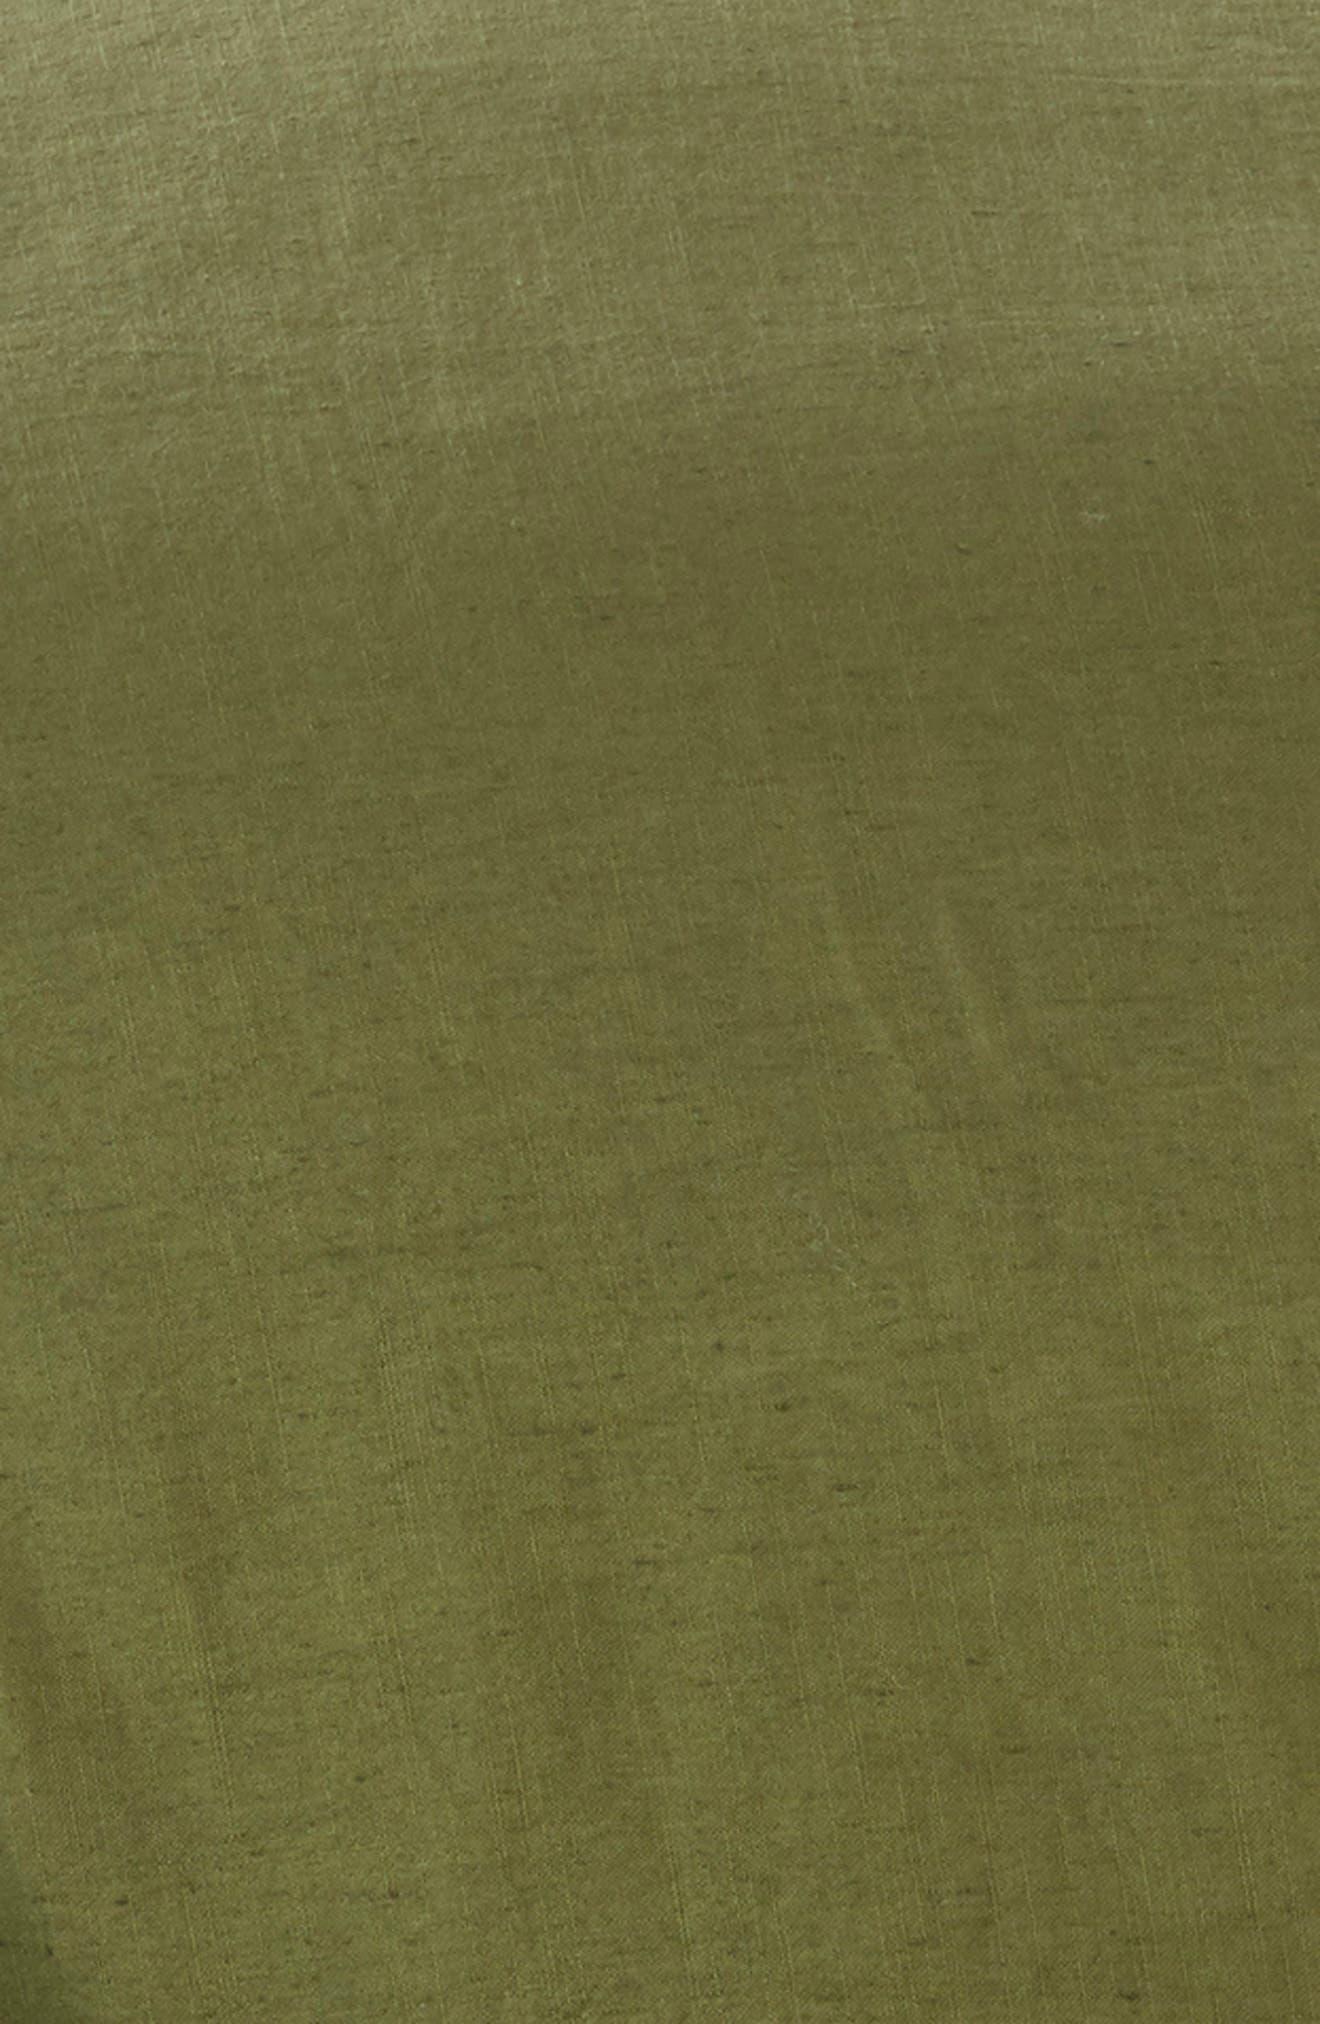 Relaxed Cotton & Linen Duvet Cover,                             Alternate thumbnail 3, color,                             Olive Spice